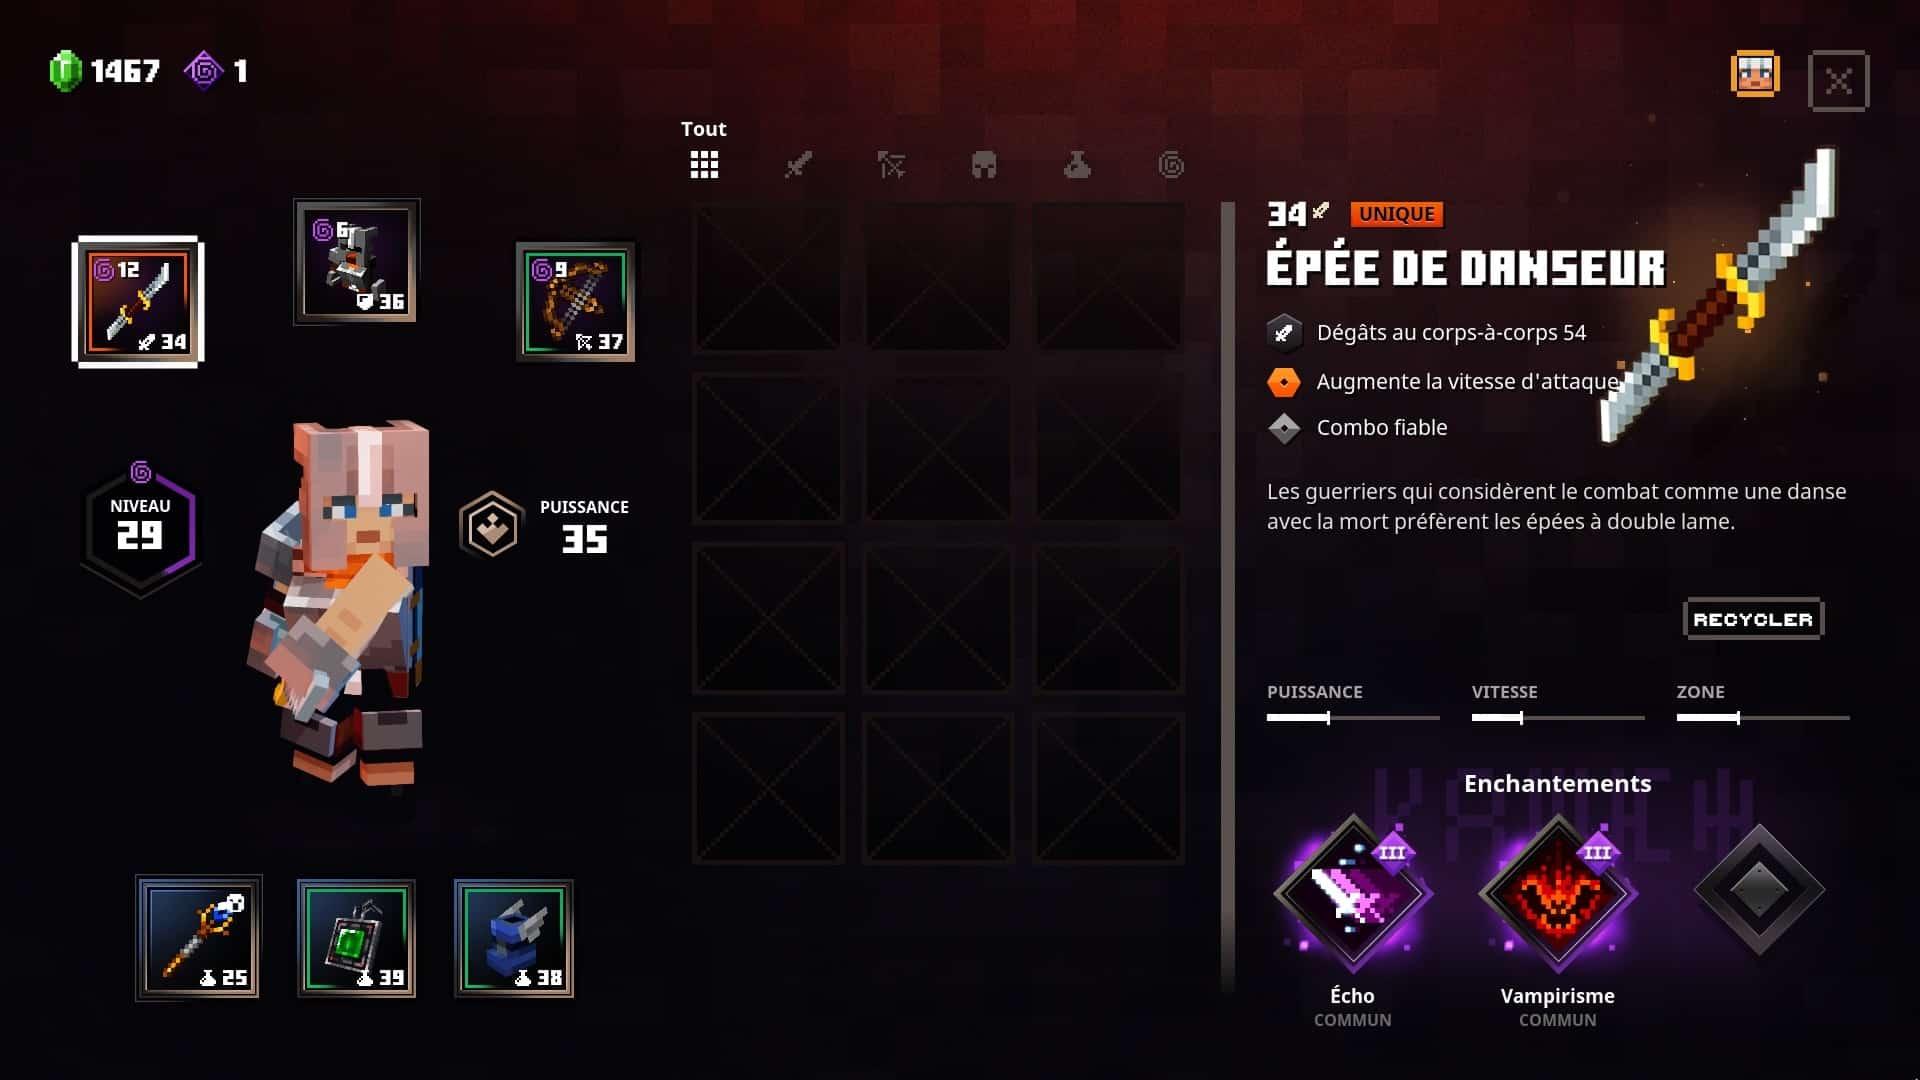 minecraft-dungeons-inventaire-equipement-enchantement